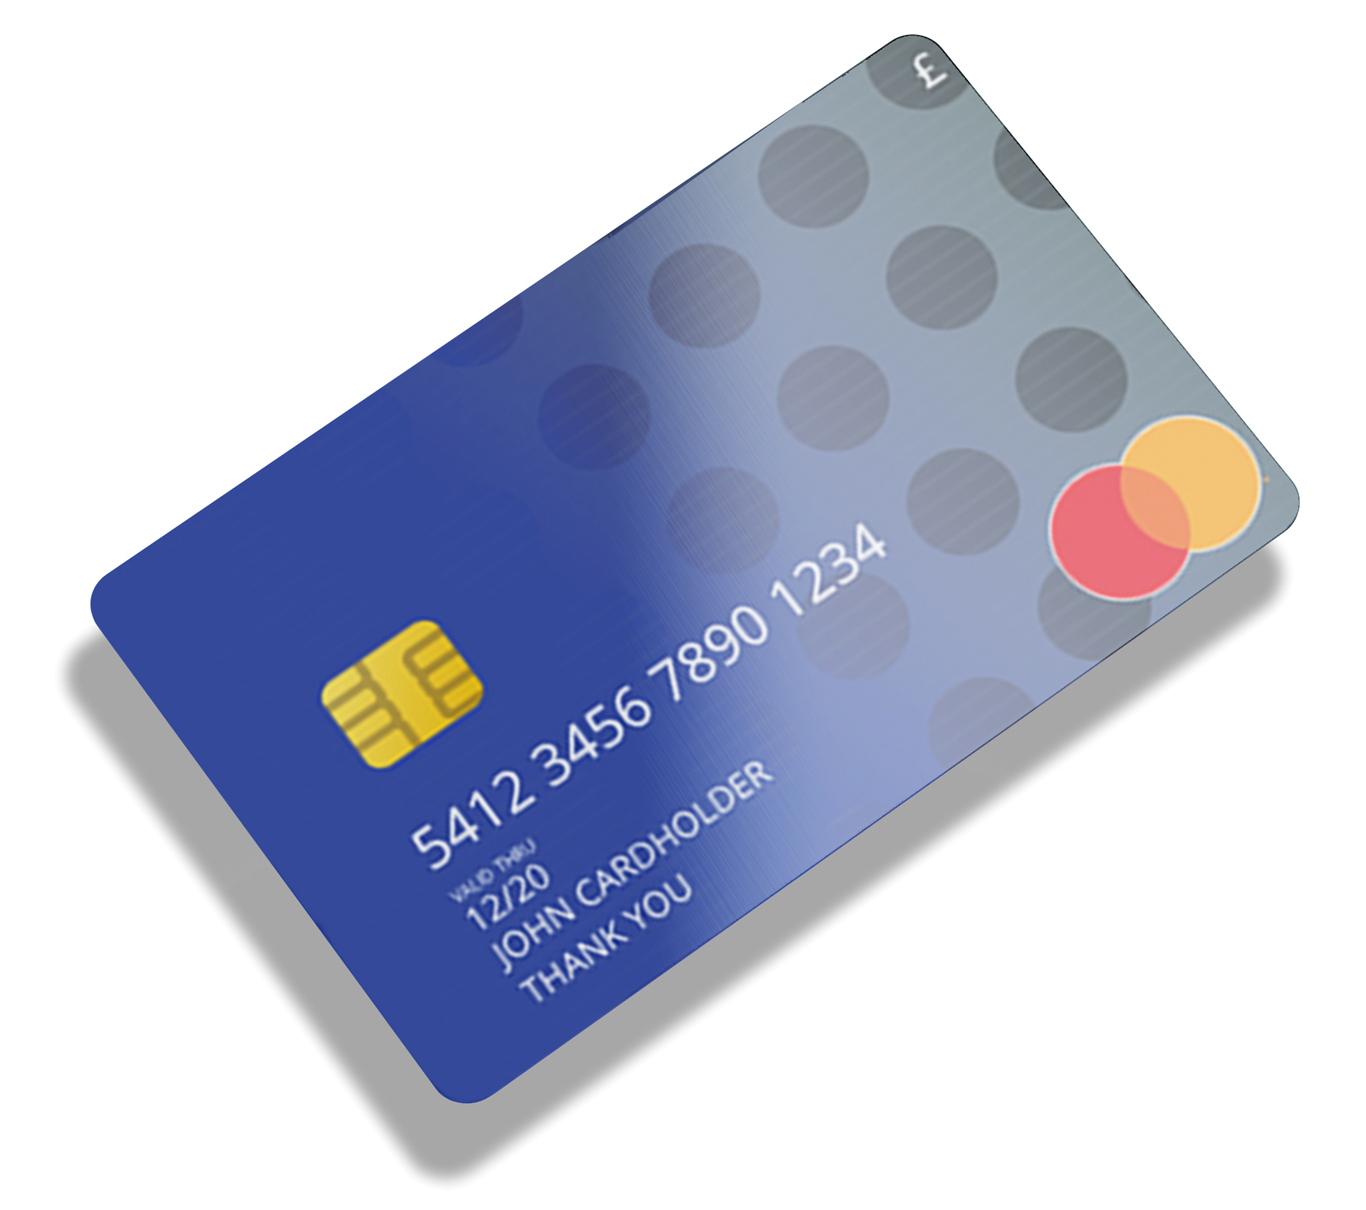 reward-pass-card-mockup-4